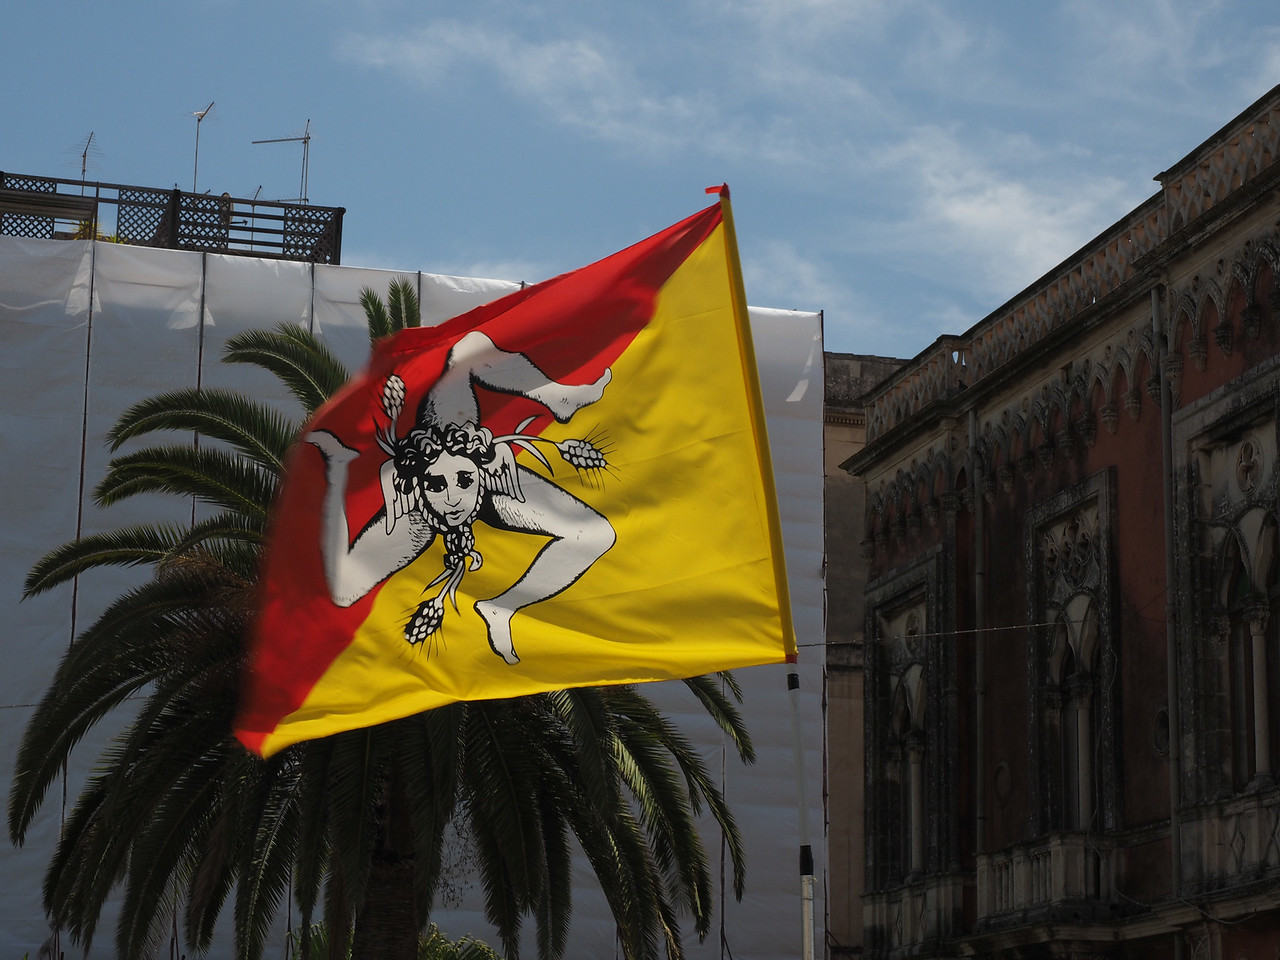 Flag of Sicily Legs mimic its triangular shape